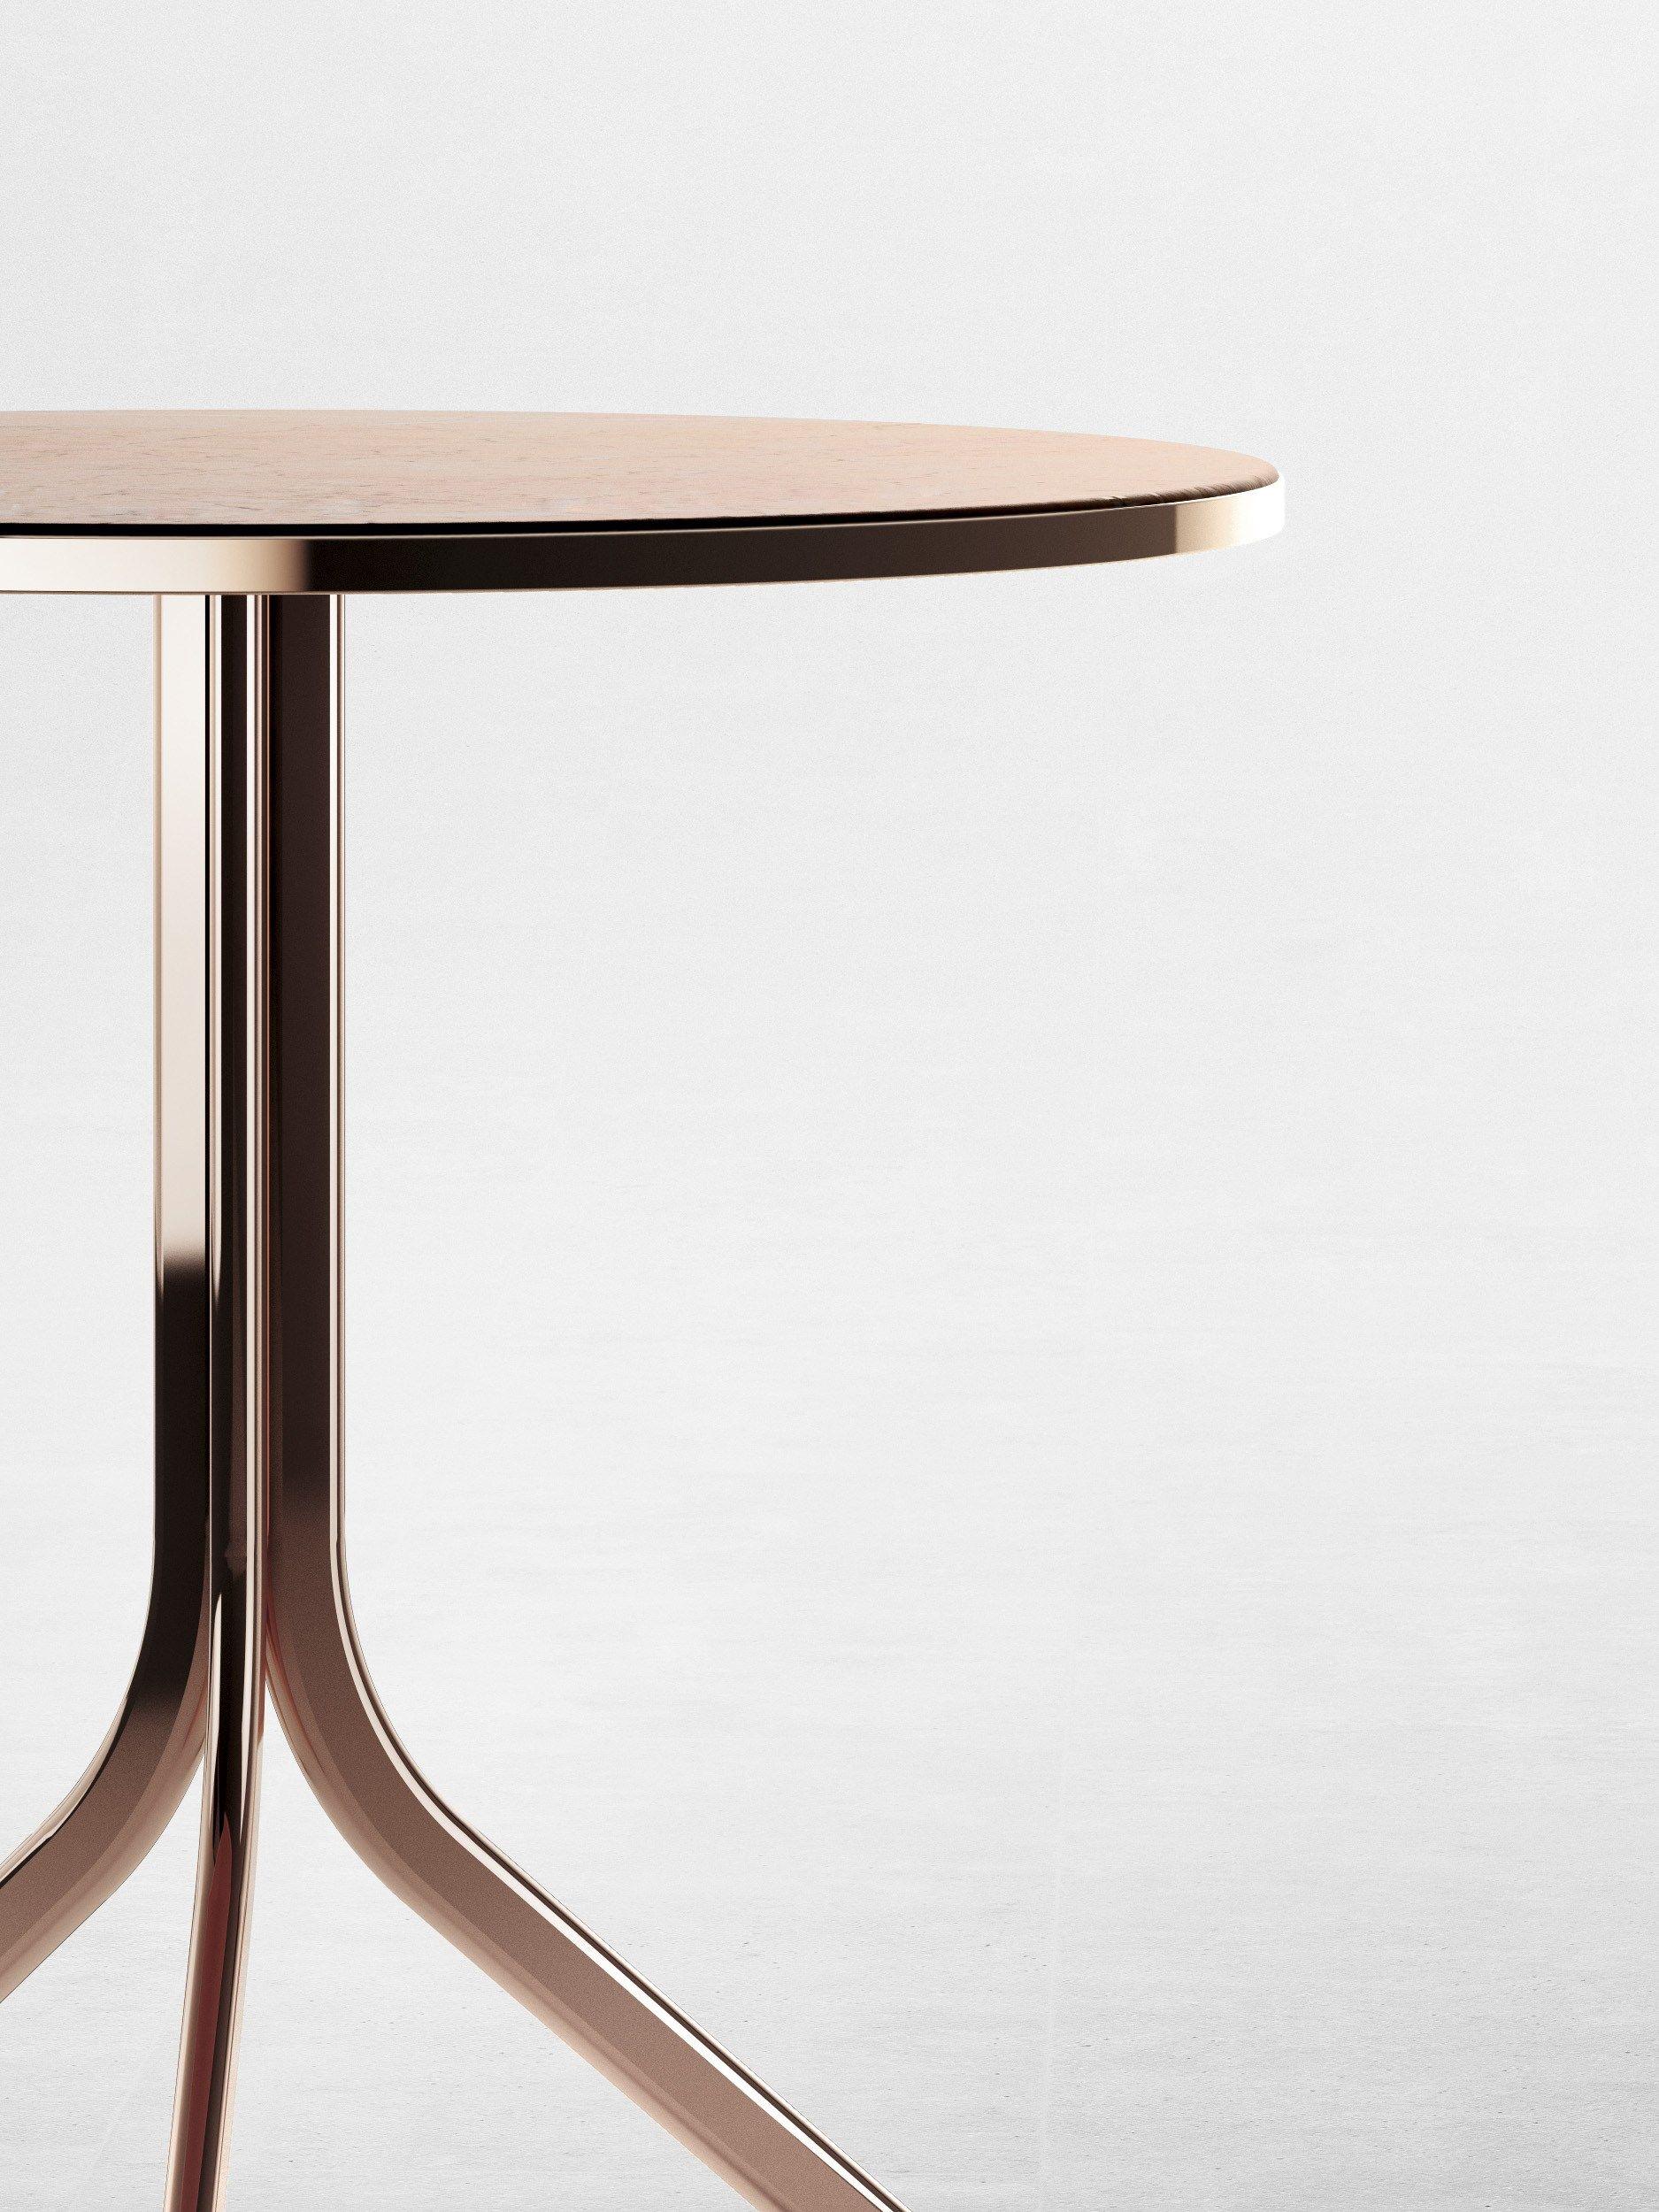 Bistro Dining Table By Jean Louis Iratzoki For Retegui Bistro Dining Table Bistro Furniture Bistro Table